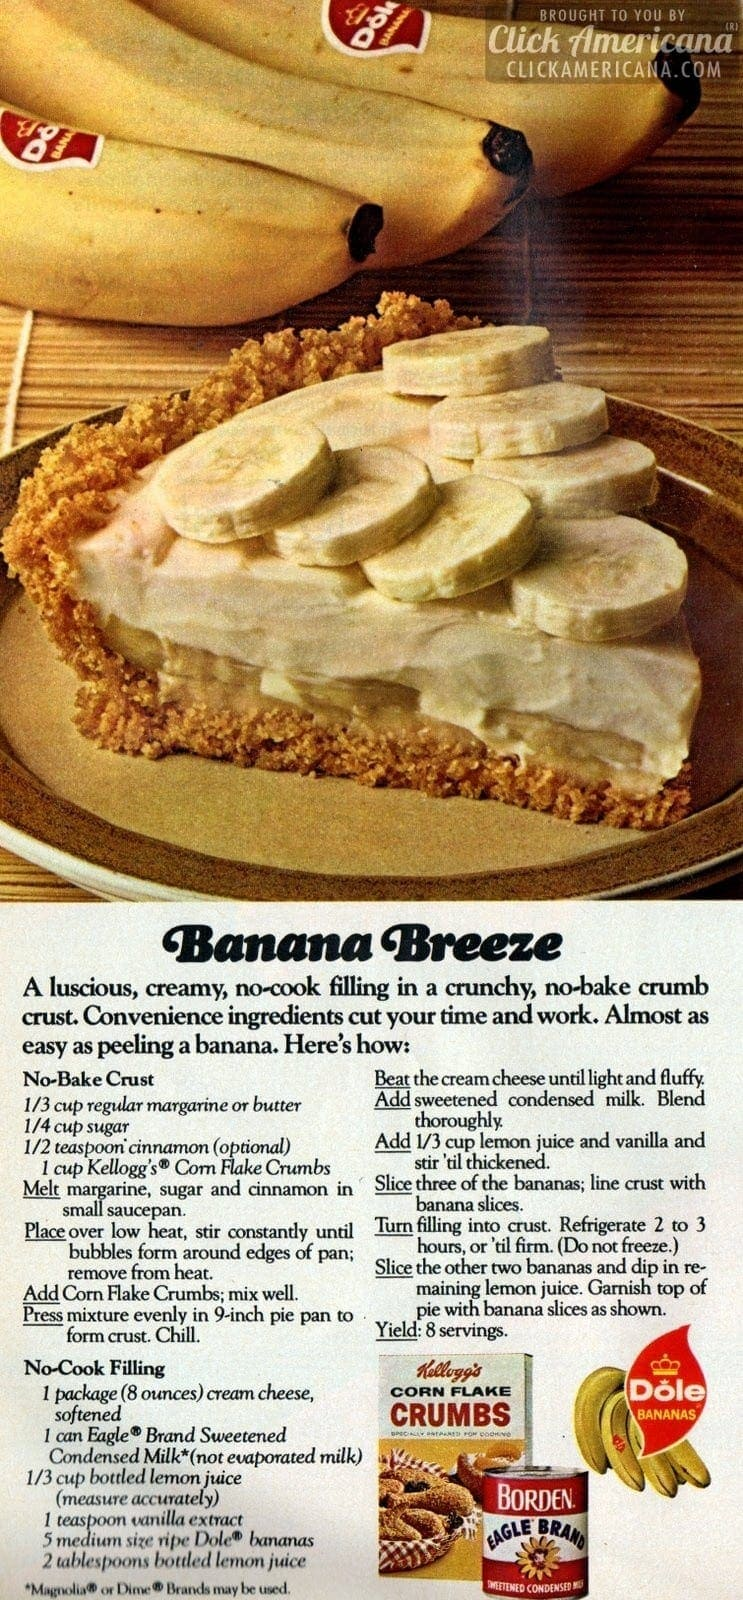 No-cook banana cream pie, Fruit crunch cake & Almond pear parfait recipes